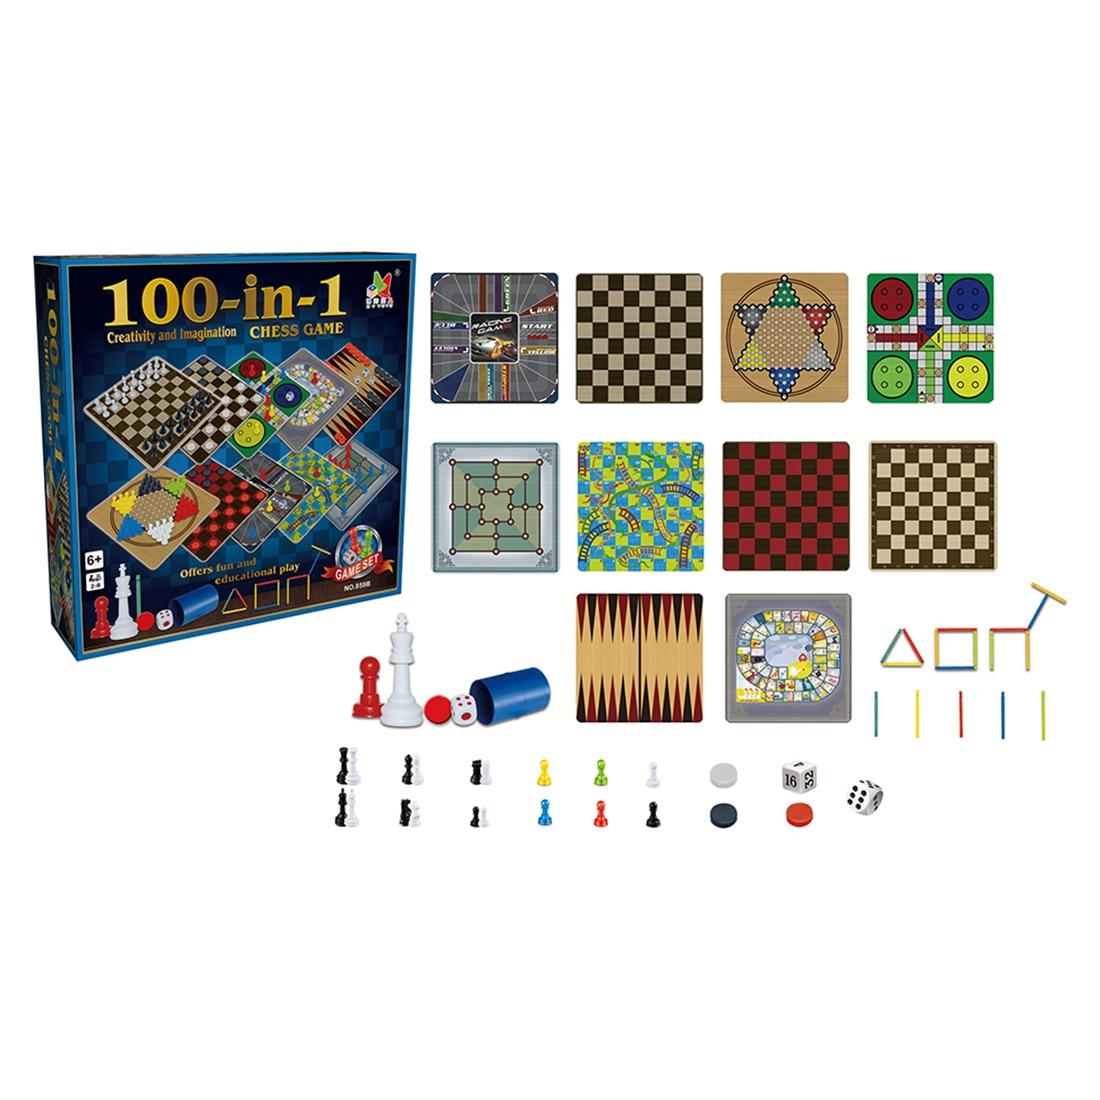 100 in 1 board games